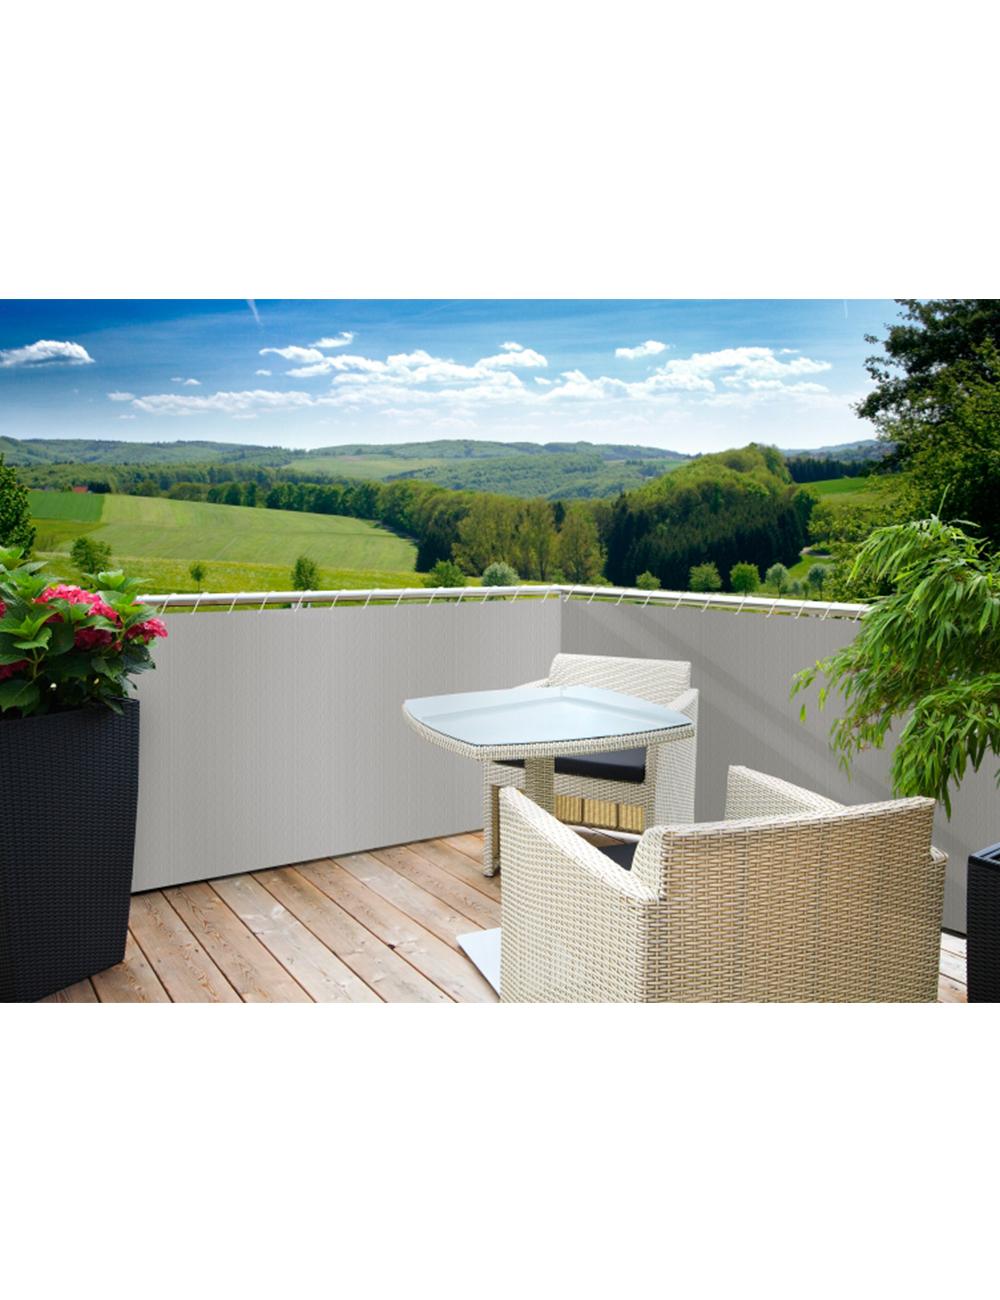 cache balcon gris. Black Bedroom Furniture Sets. Home Design Ideas